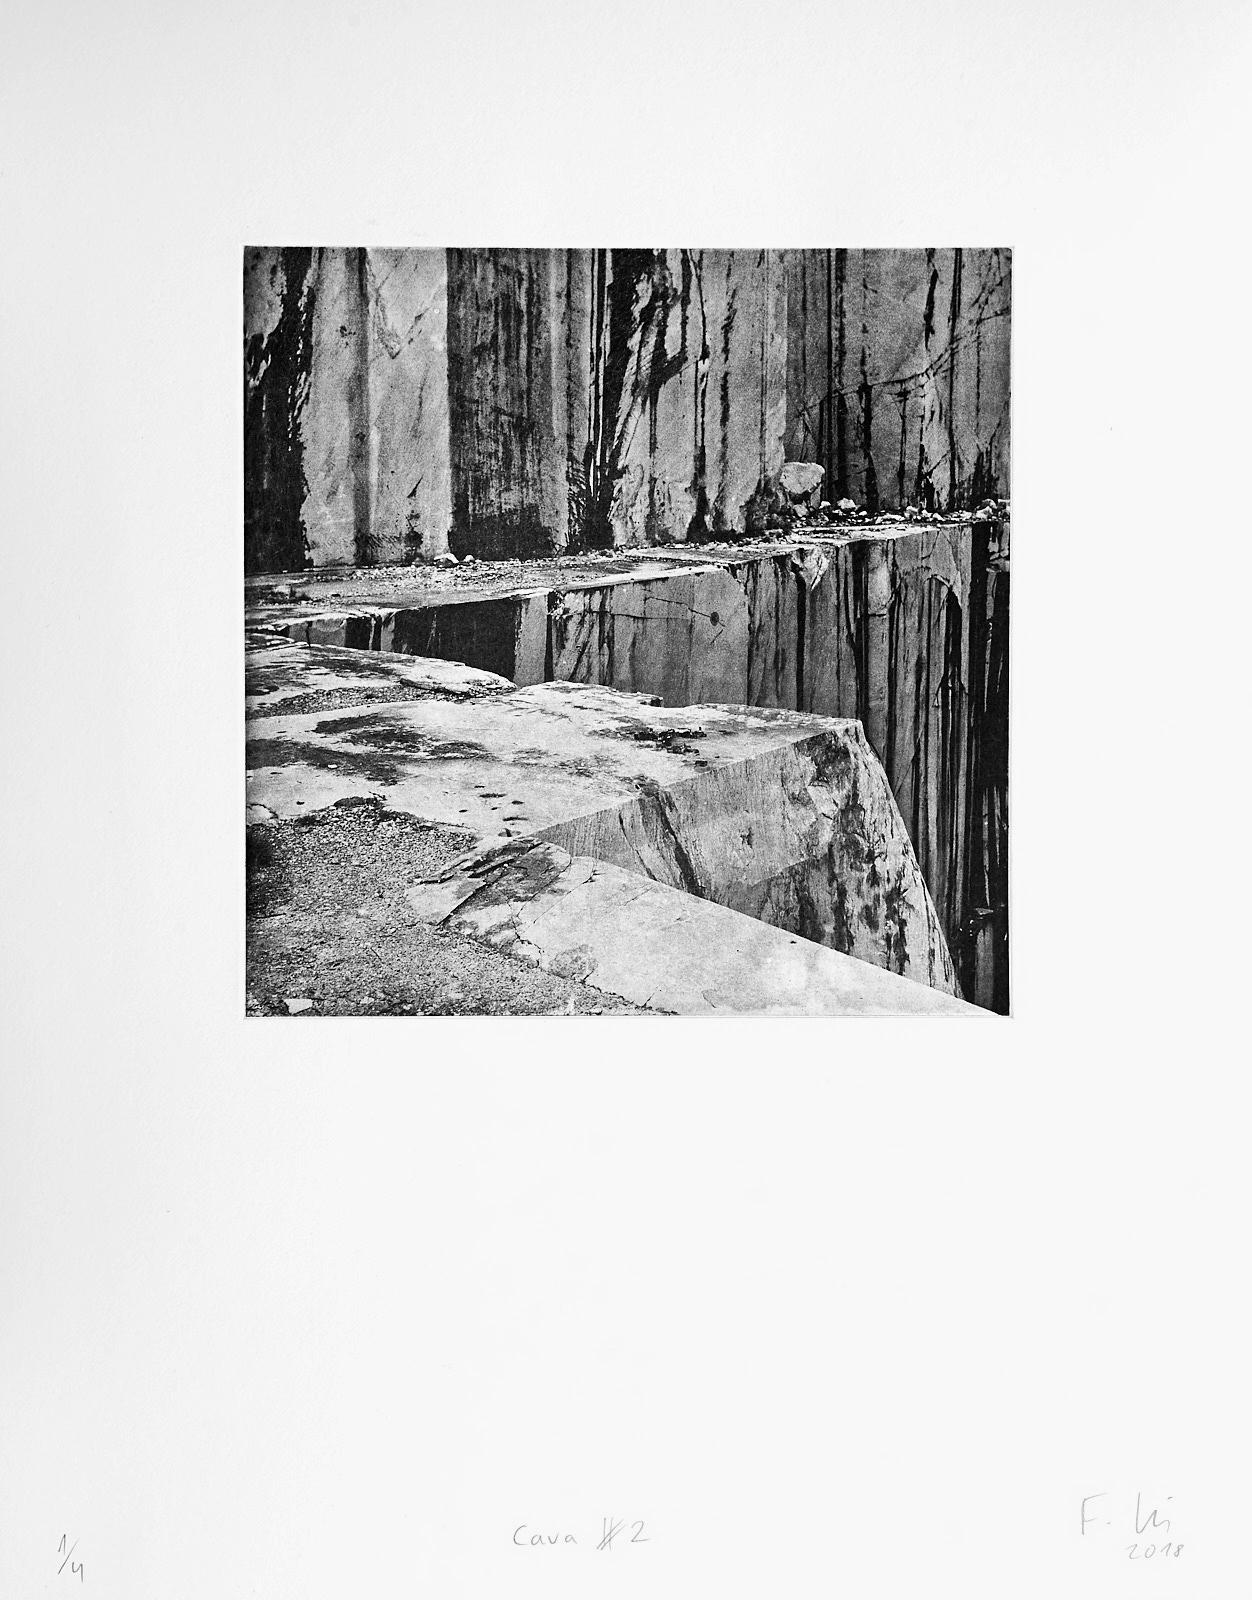 Cava #2 (2018)  medium: Photogravure  size: 36 x 46 cm  paper: Zerkall 270 g/qm  plate: 21.5 x 21.5 cm  edition: 7 copies  numbered: 1/4 - 4/4, 3 e.a.  printer: FWU